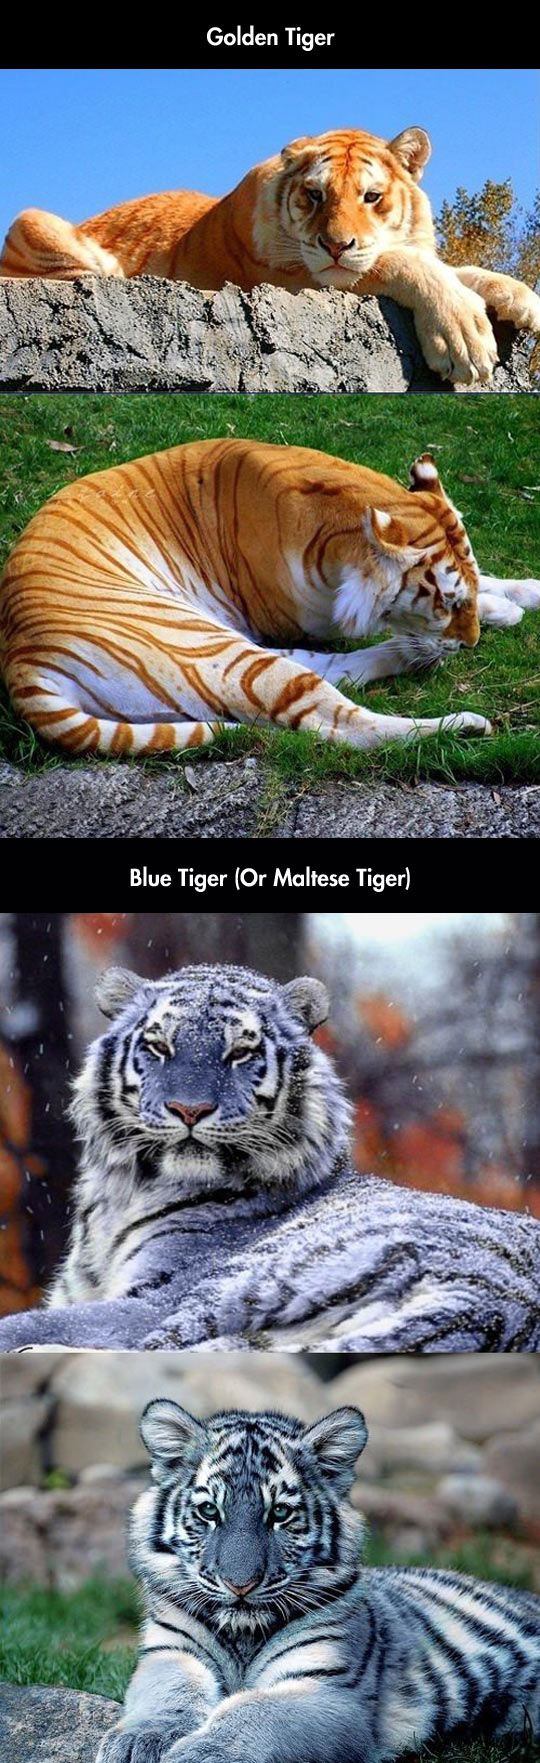 I Had No Idea There Were Blue Colored Tigers Too